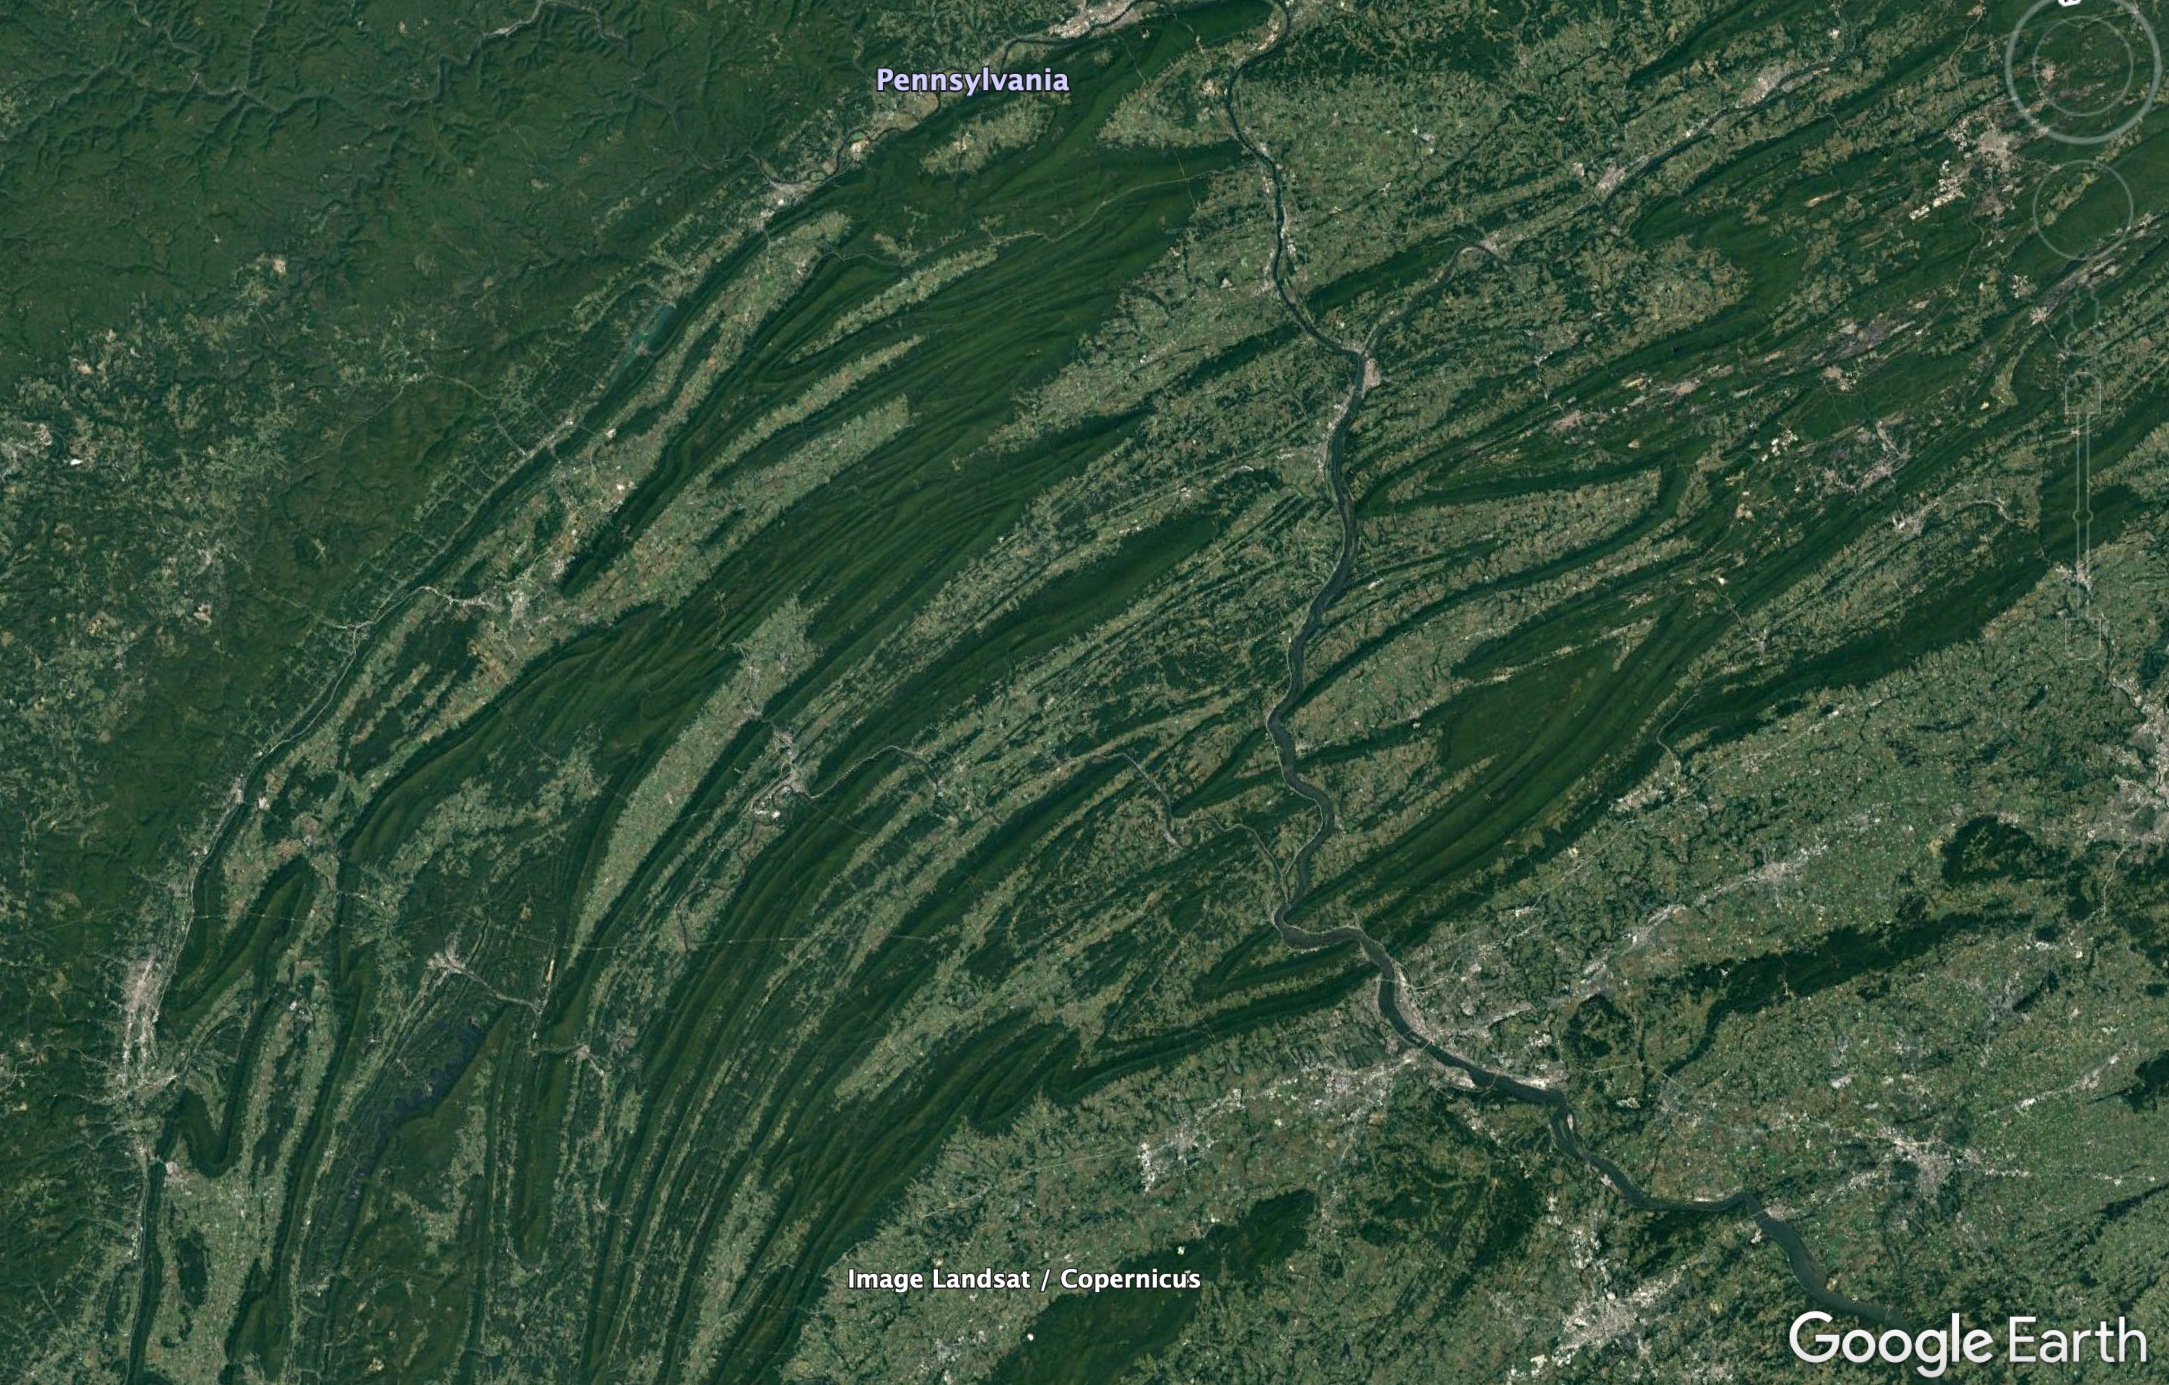 Google Earth Image of the Appalachian Mountain fold belt in western Pennsylvania at 200 km eye altitude.